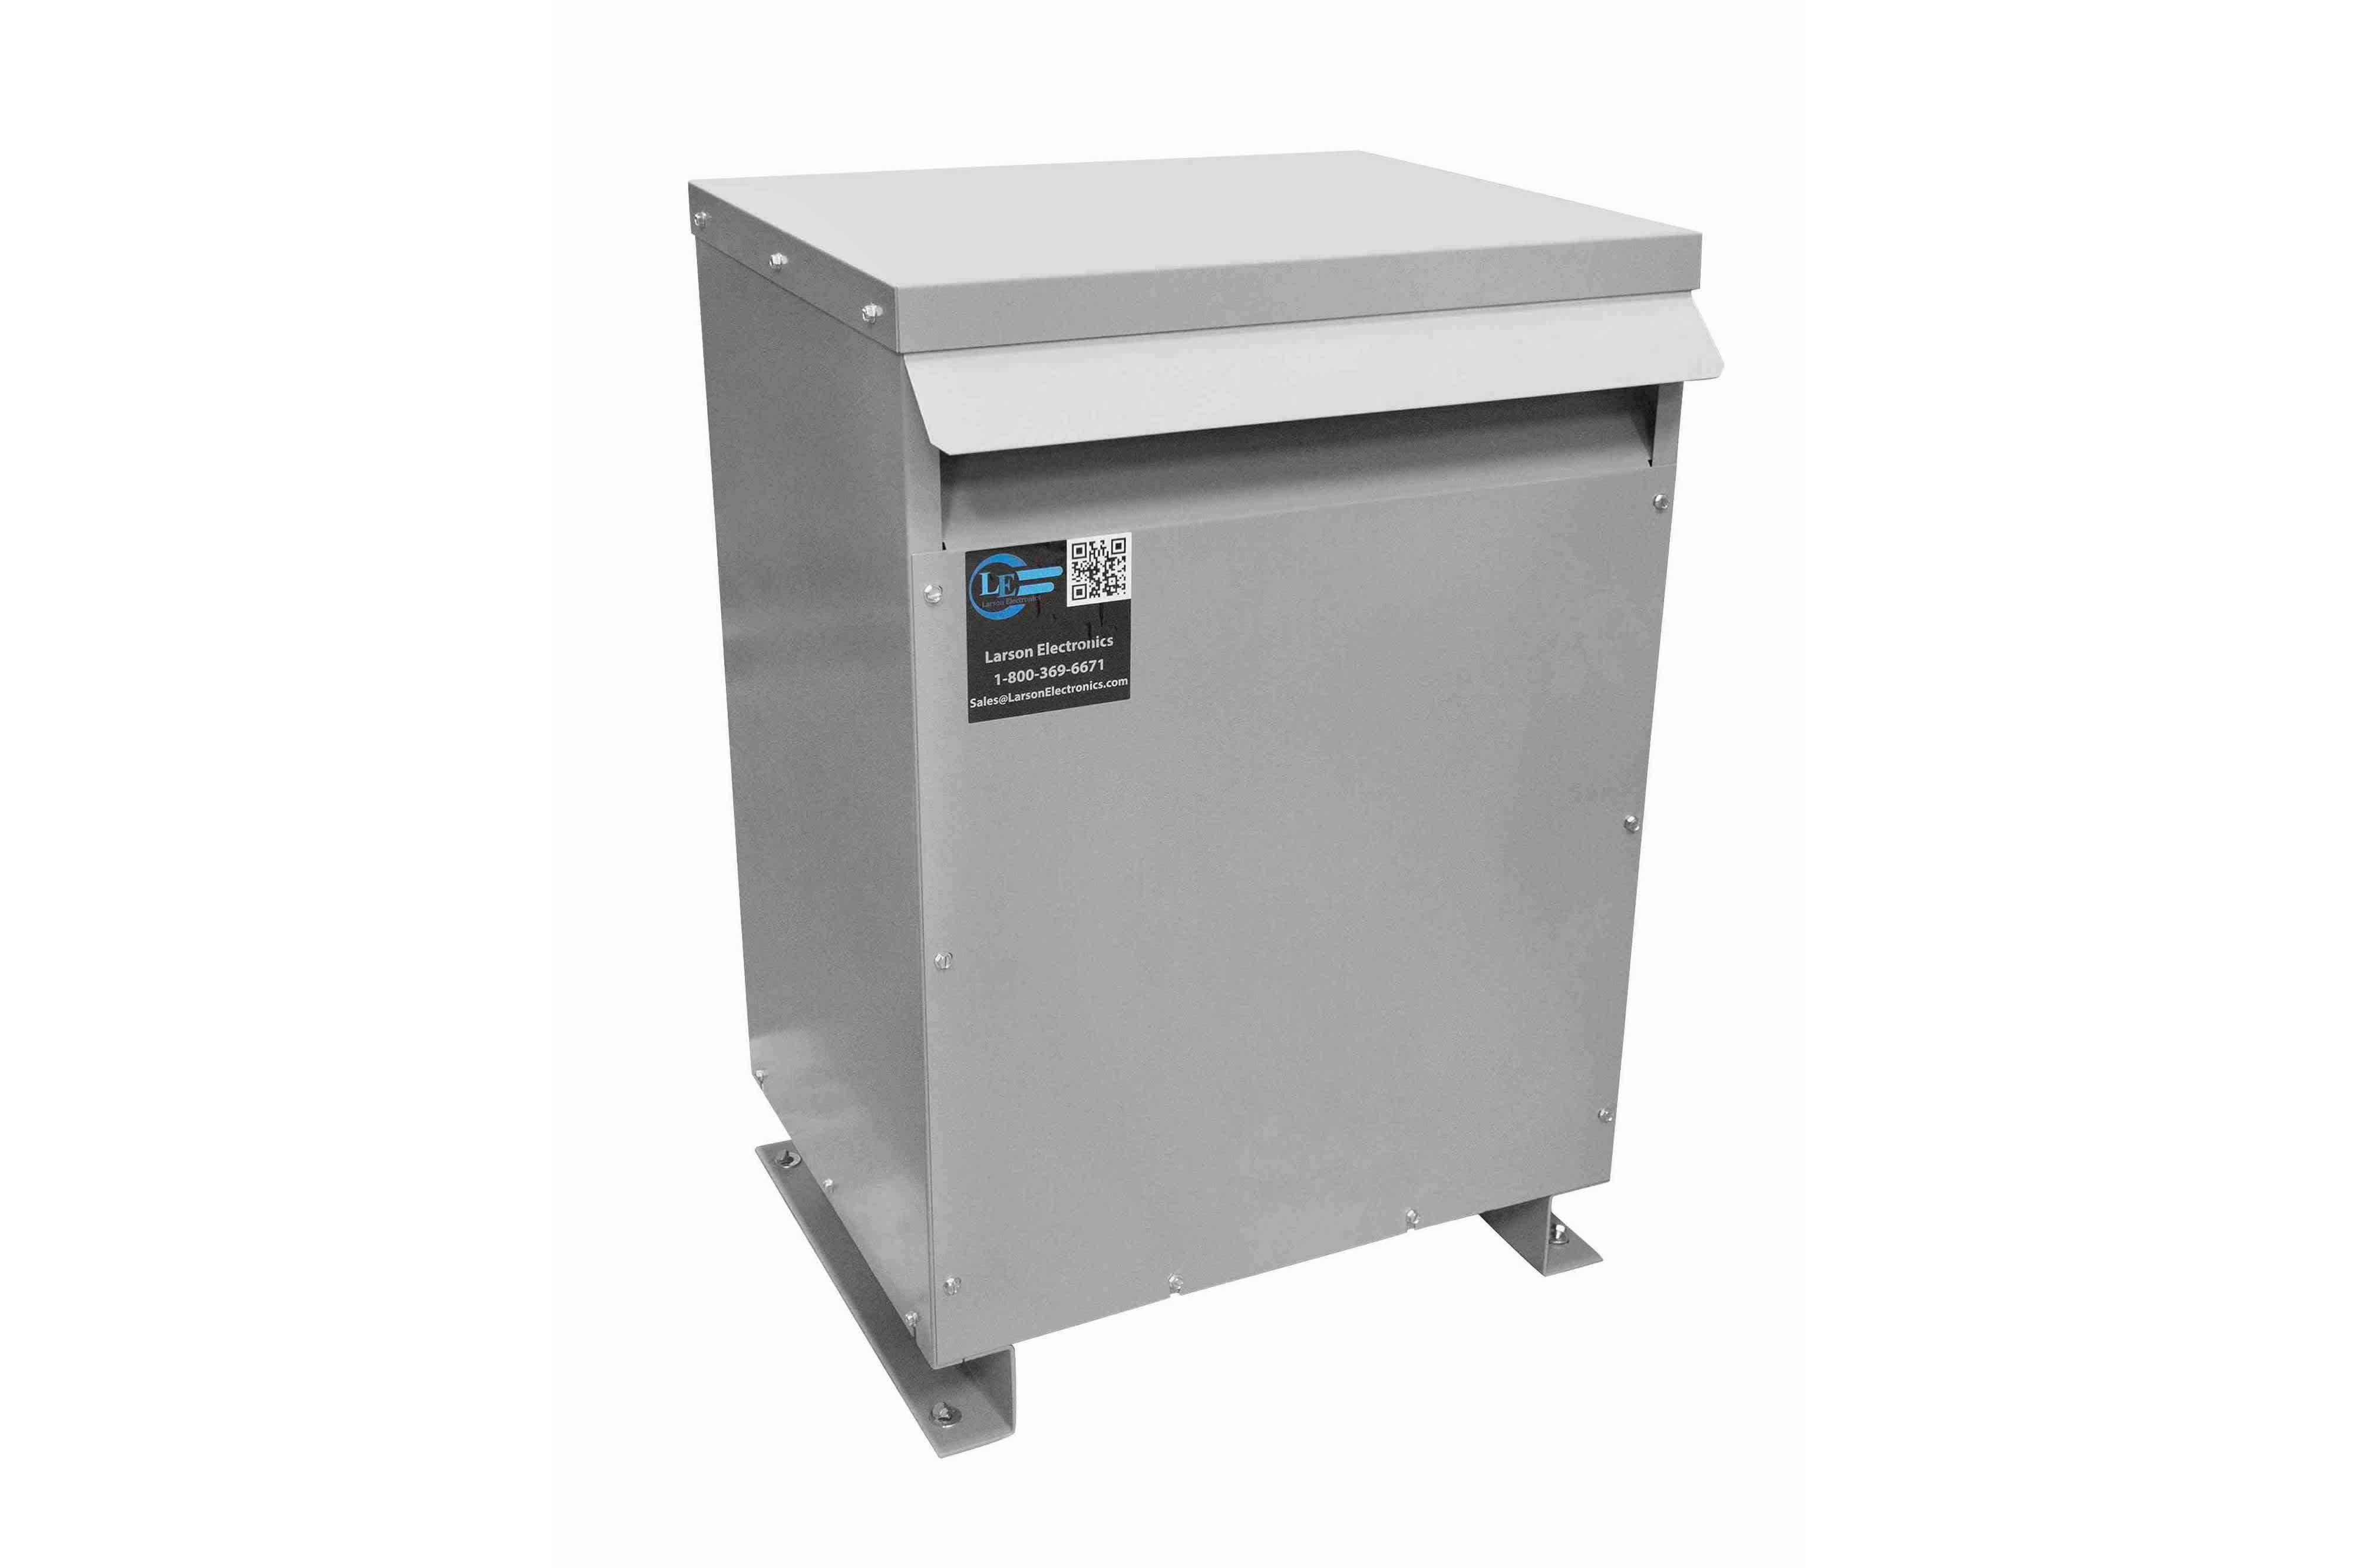 22.5 kVA 3PH Isolation Transformer, 415V Wye Primary, 600Y/347 Wye-N Secondary, N3R, Ventilated, 60 Hz